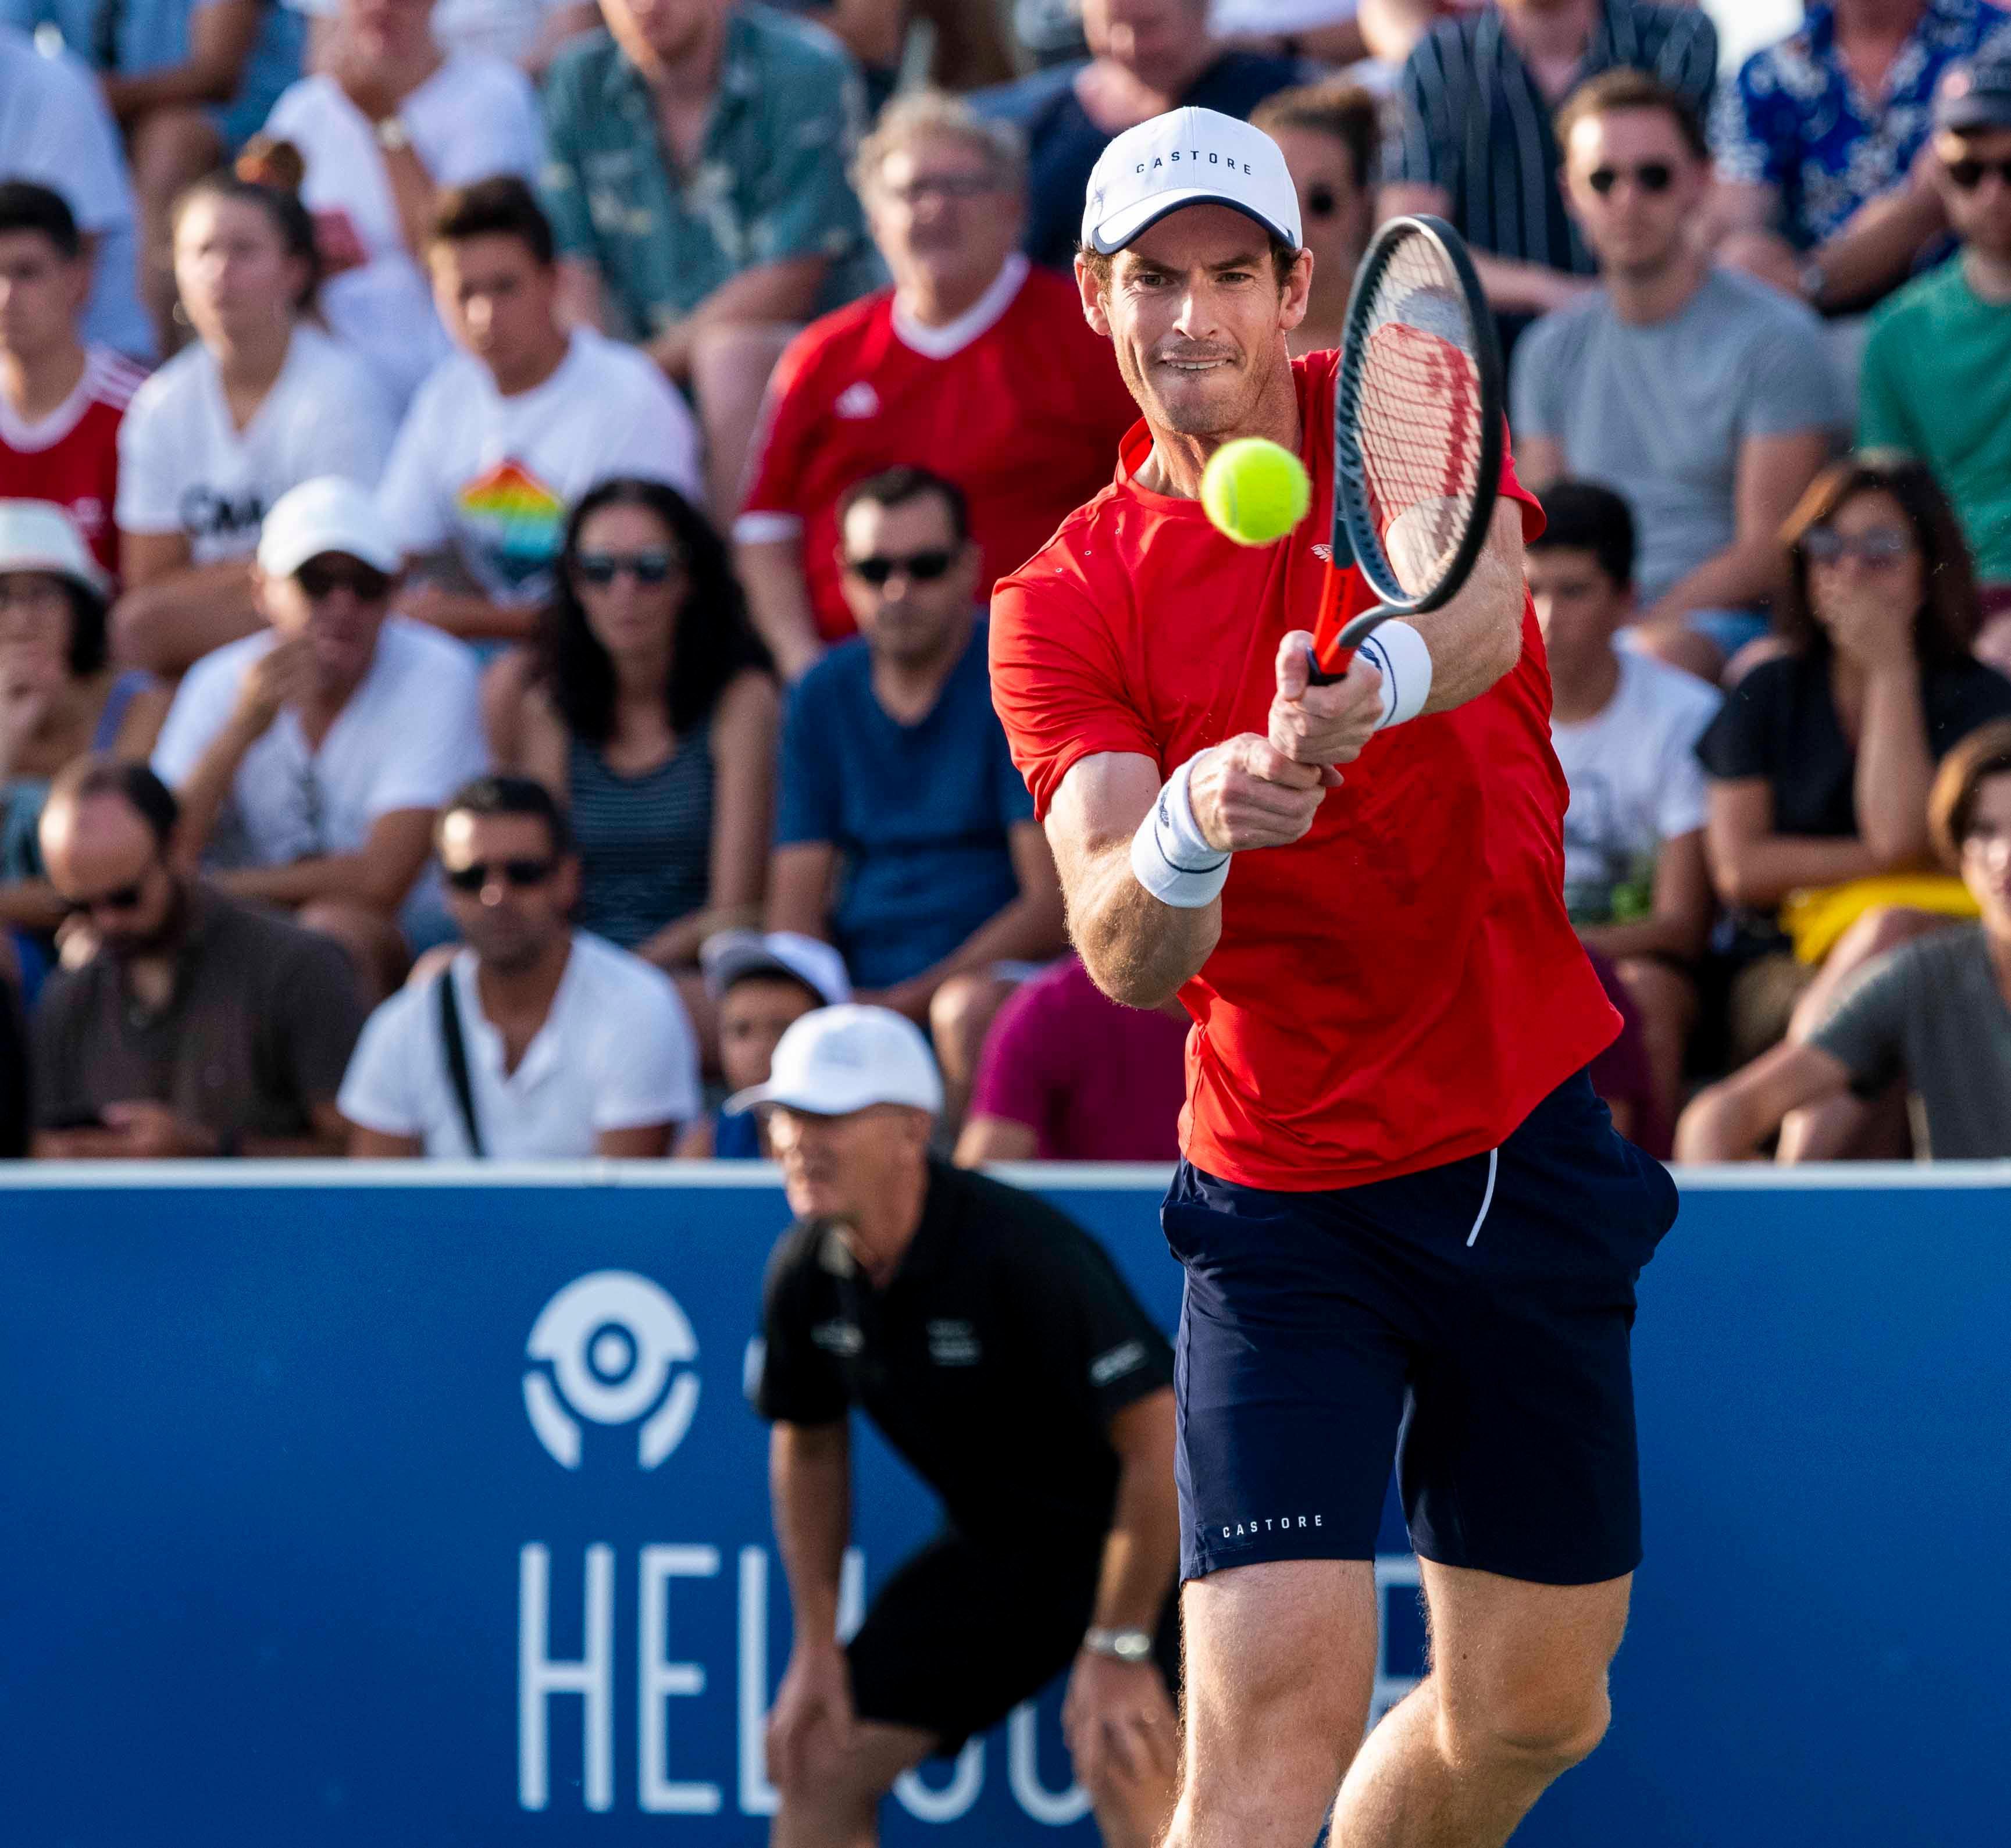 Martina Navratilova Assesses Andy Murray S Chances Of Reaching Top 10 Ranking Ubitennis